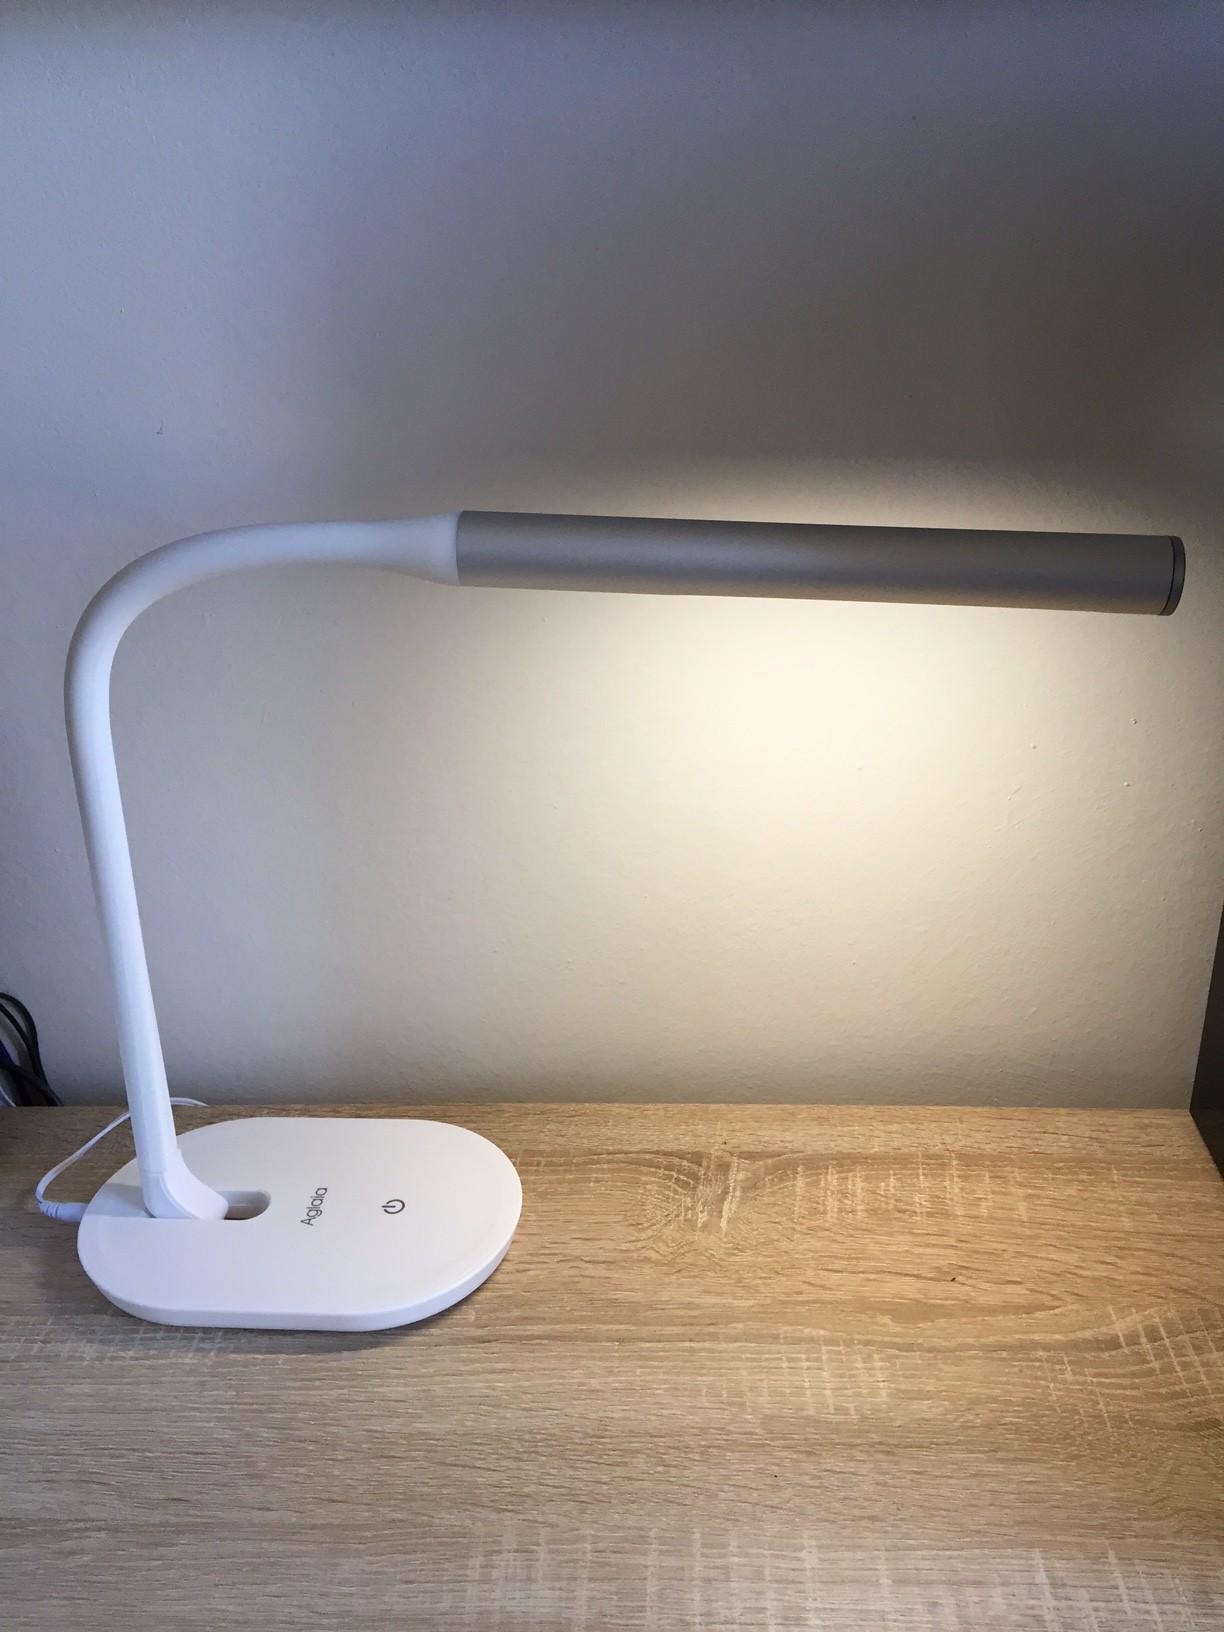 maman puissance 4 ma jolie lampe aglaia concours maman puissance 4. Black Bedroom Furniture Sets. Home Design Ideas